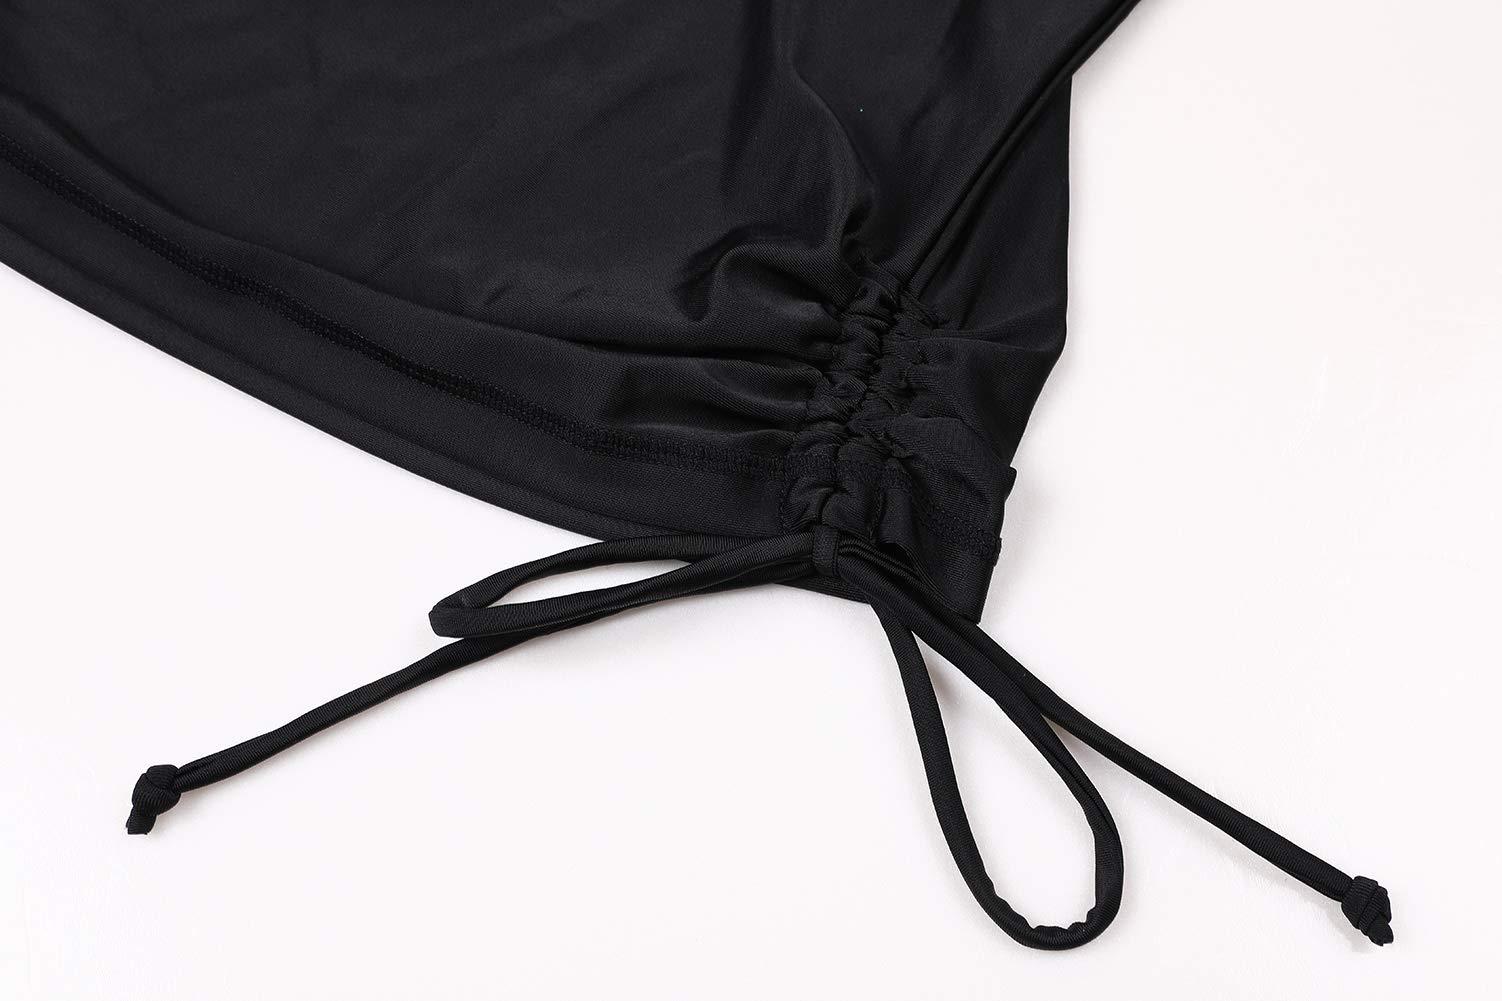 ALove Woman Long Sleeve Swim Shirt Quick Dry Rashguard Swim Top Black M by ALove (Image #5)